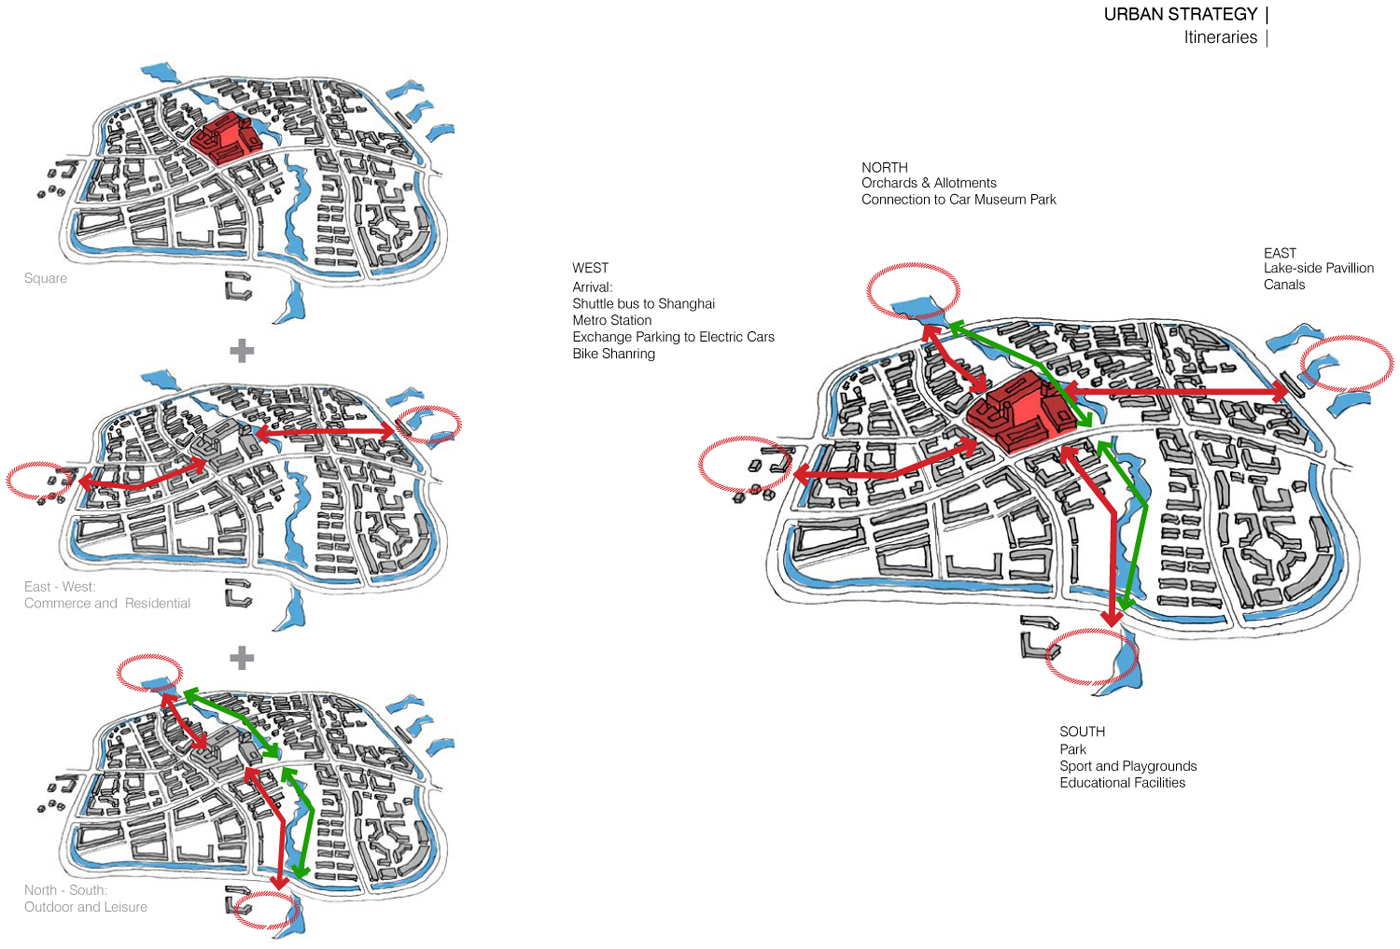 Urban Strategy - Central Square and 4 axis Kokaistudios}